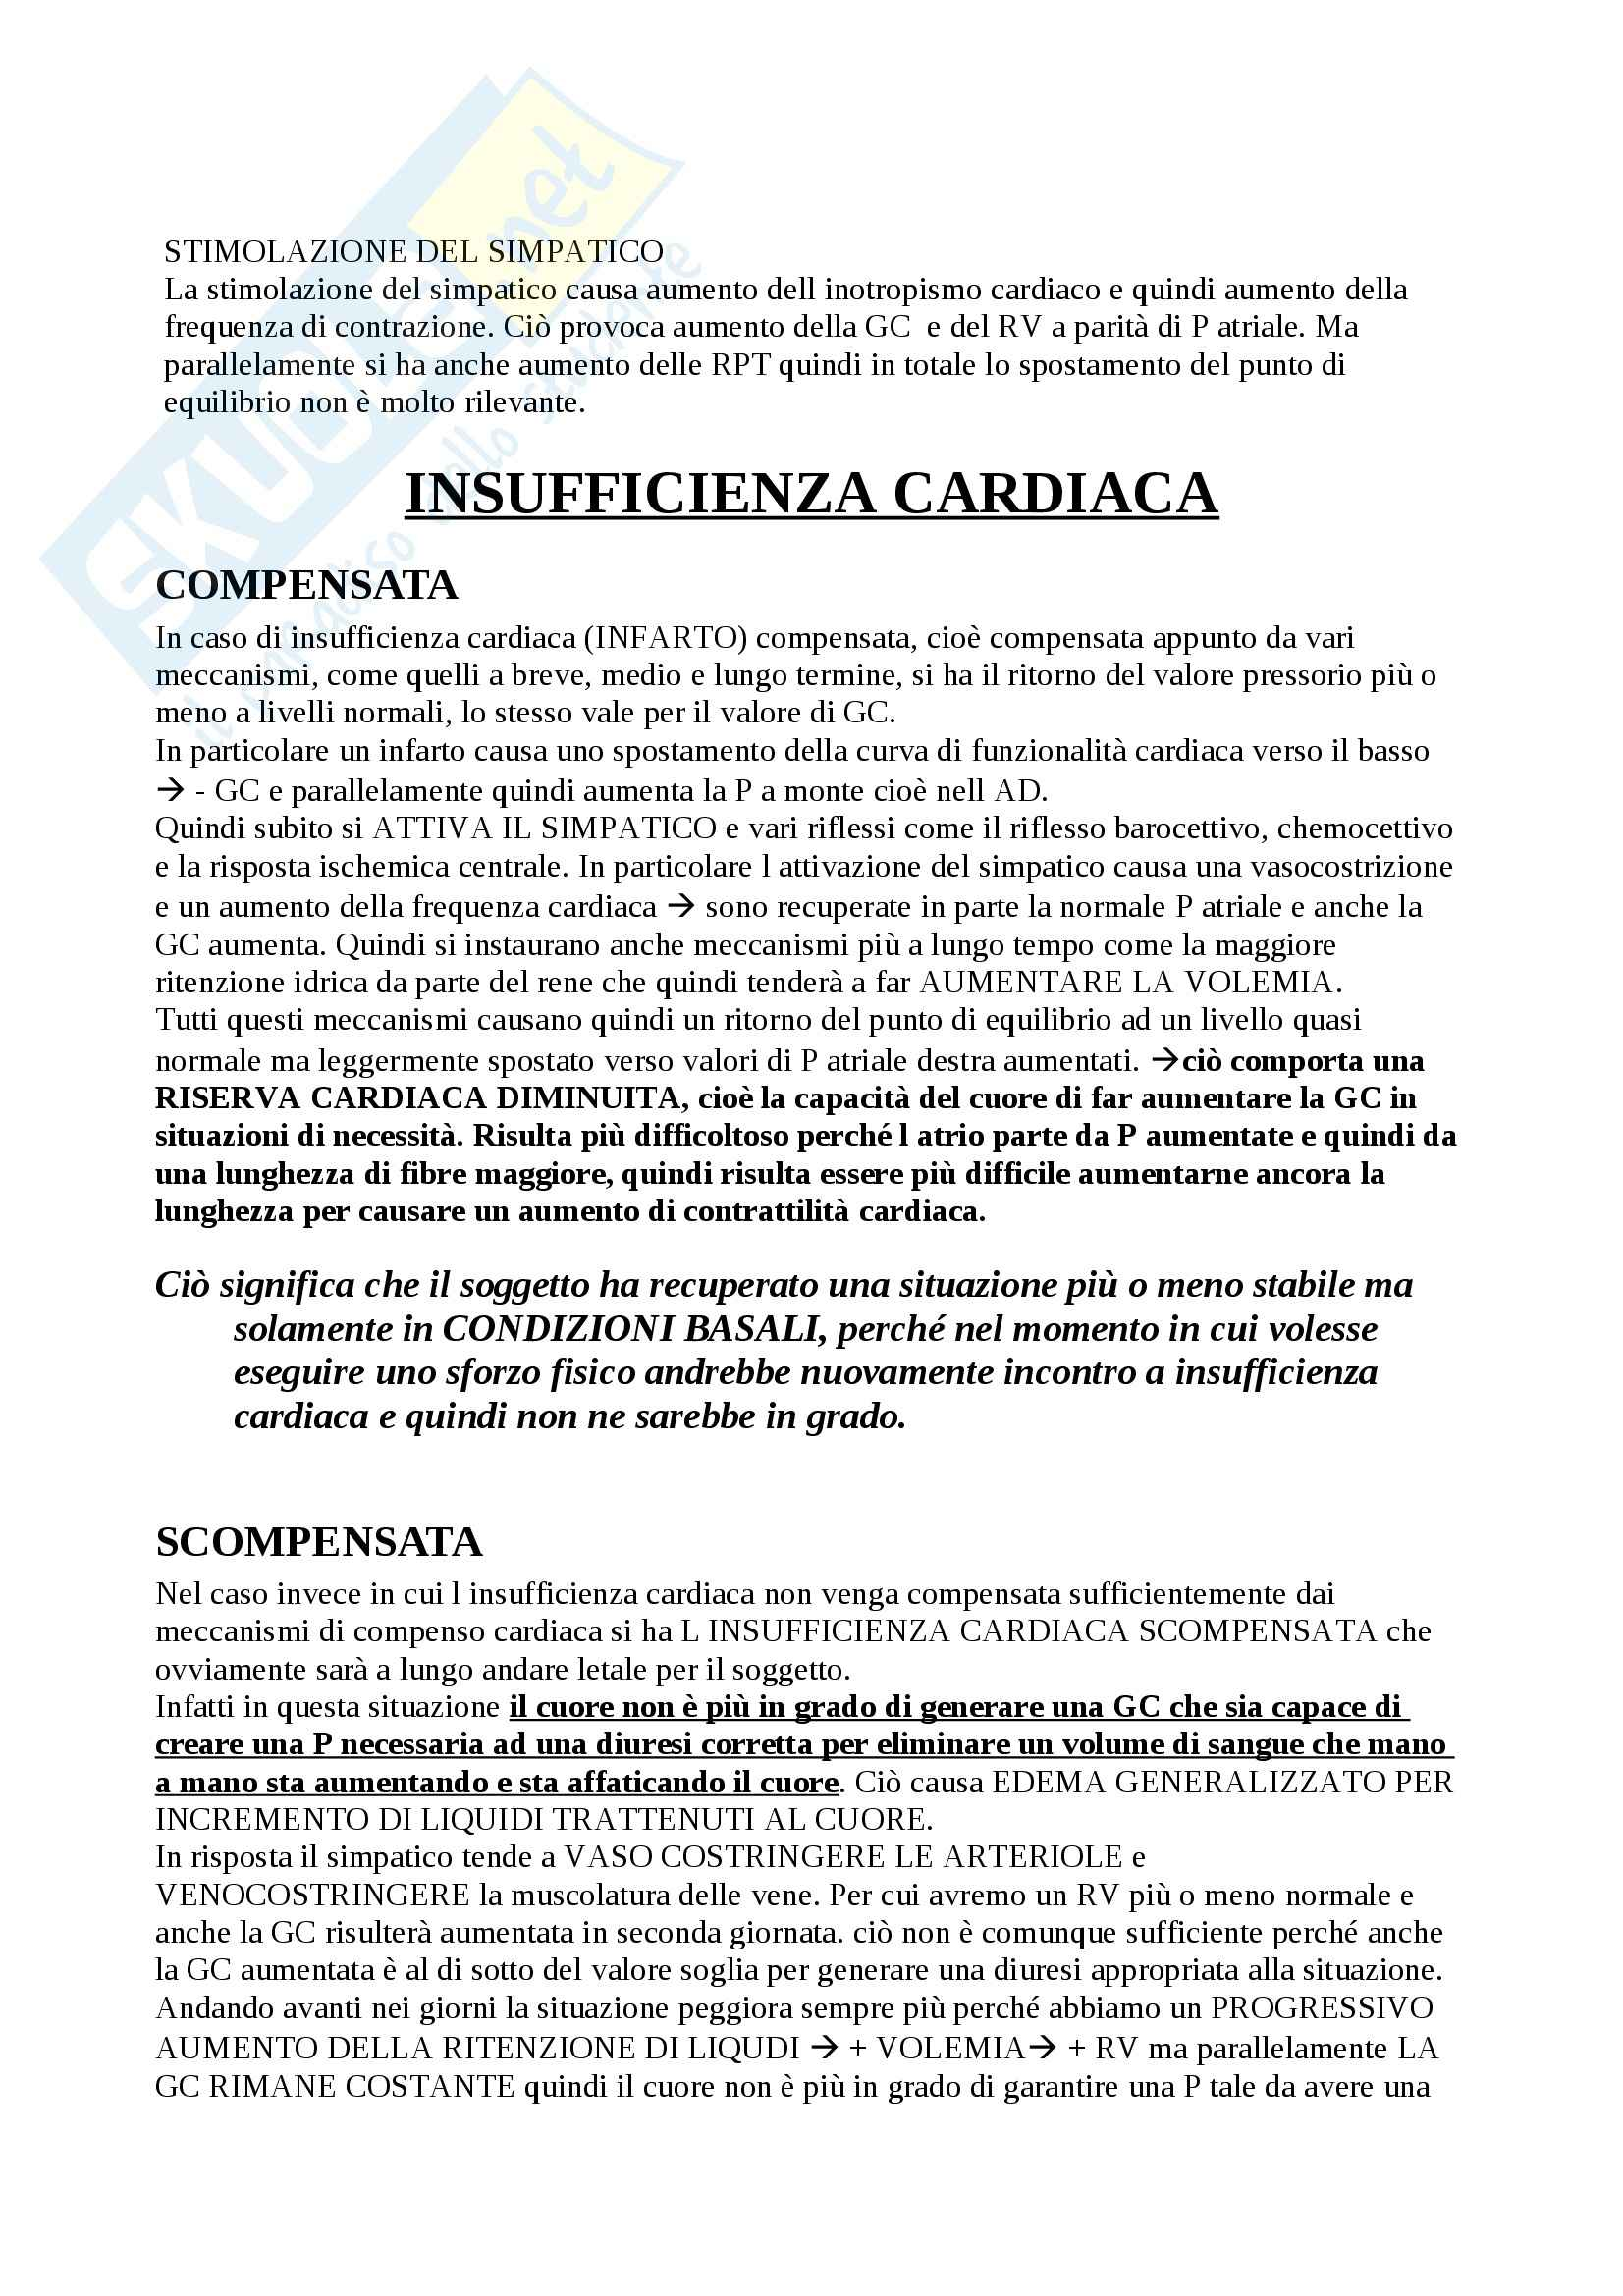 Fisiologia del sistema cardiocircolatorio, Fisiologia Pag. 46